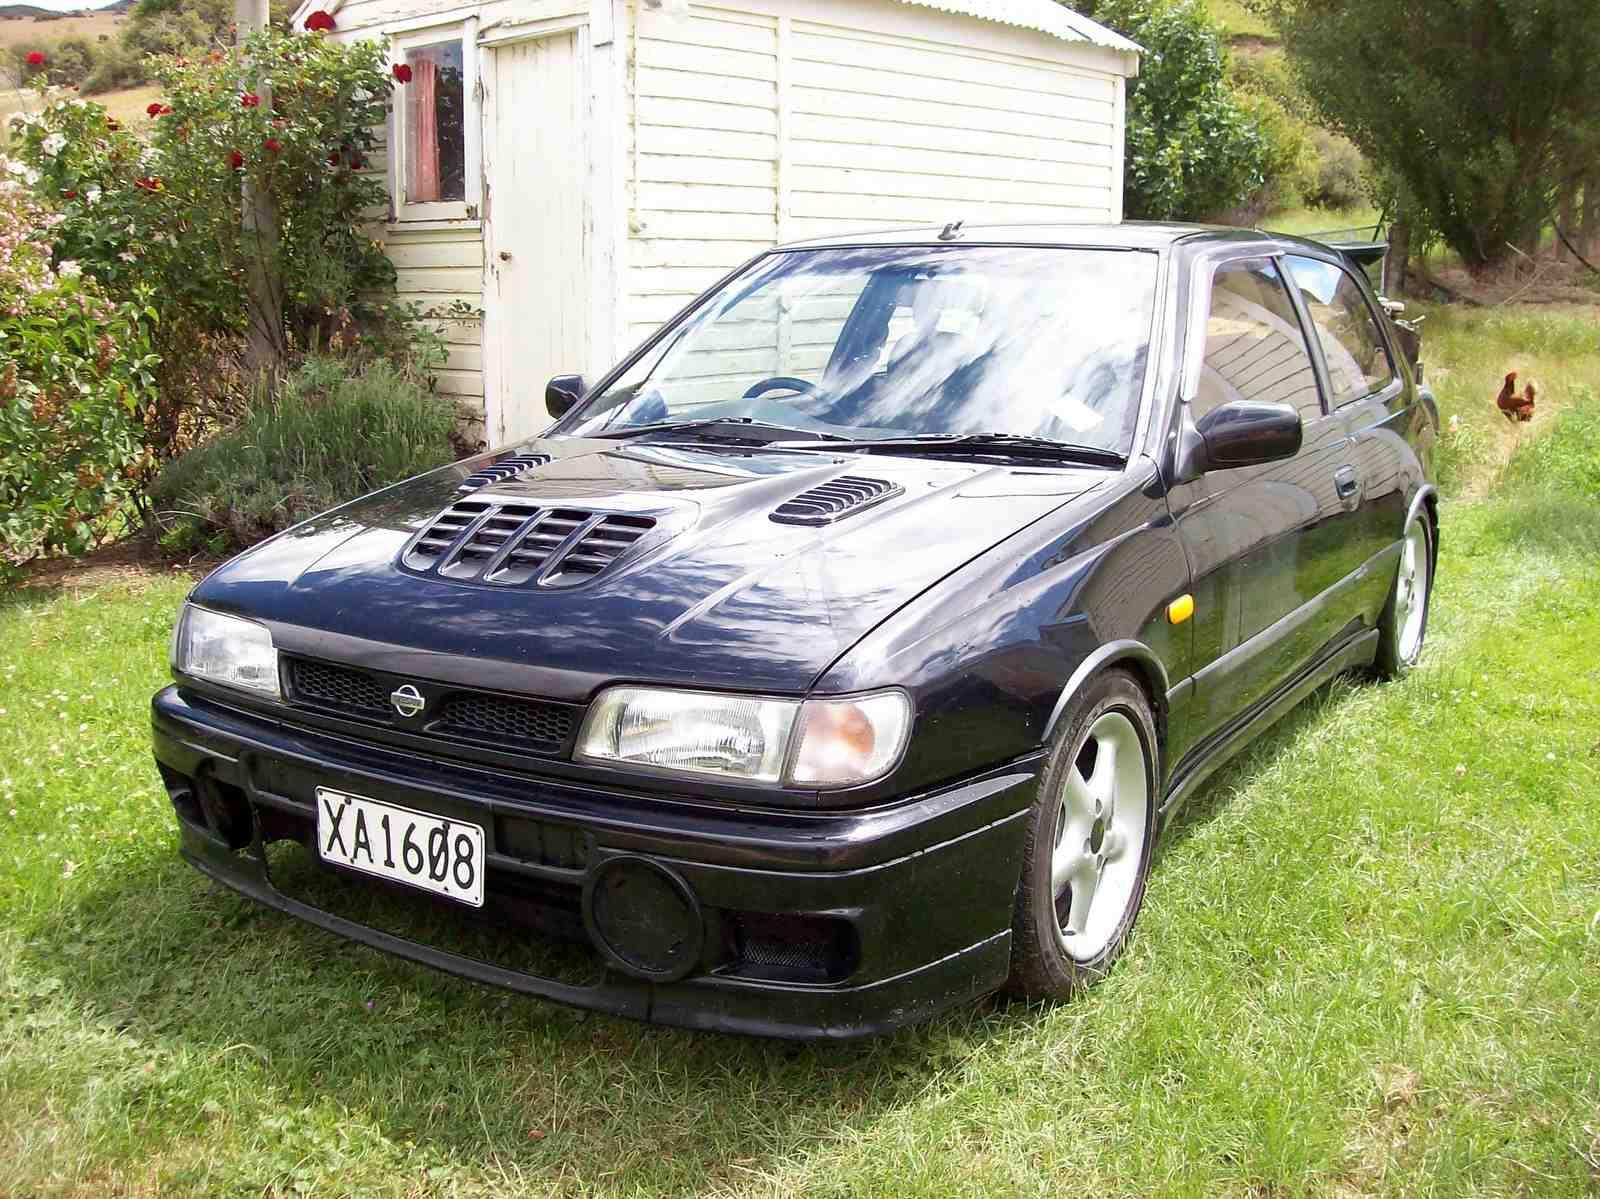 Nissan Pulsar (Model N14 Series), Sentra (Model B13 Series) 1990-